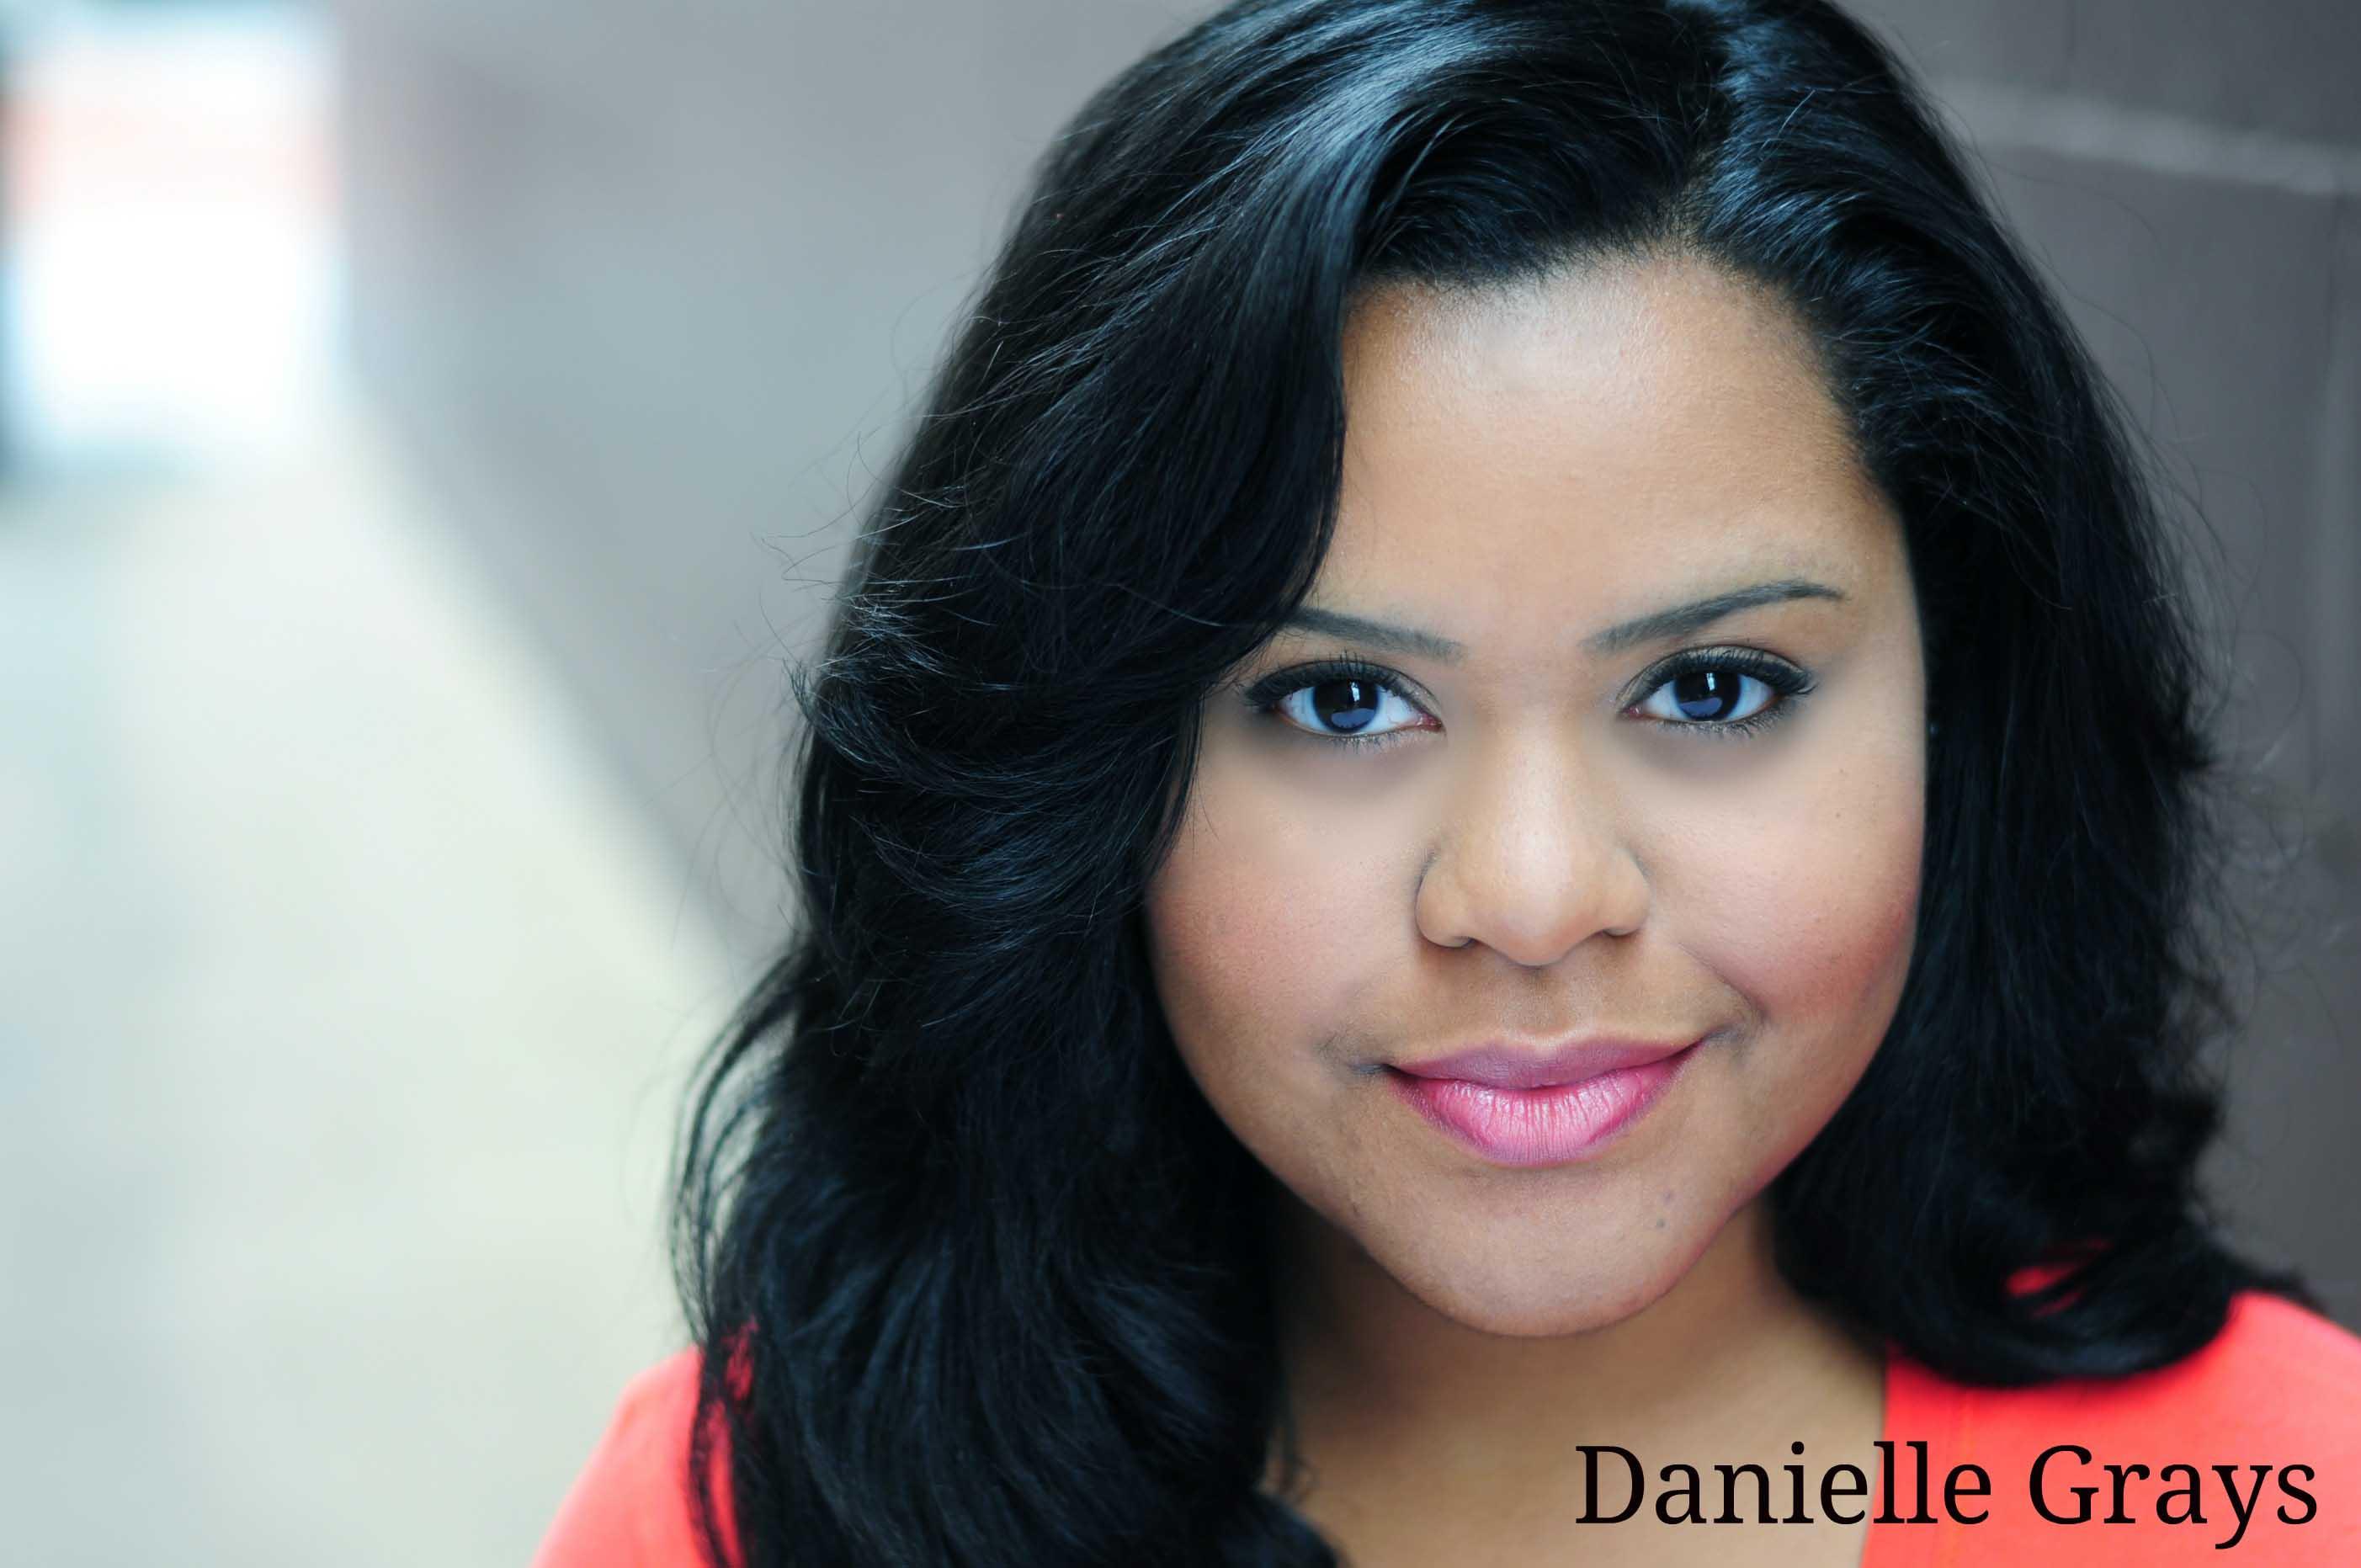 Danielle Grays